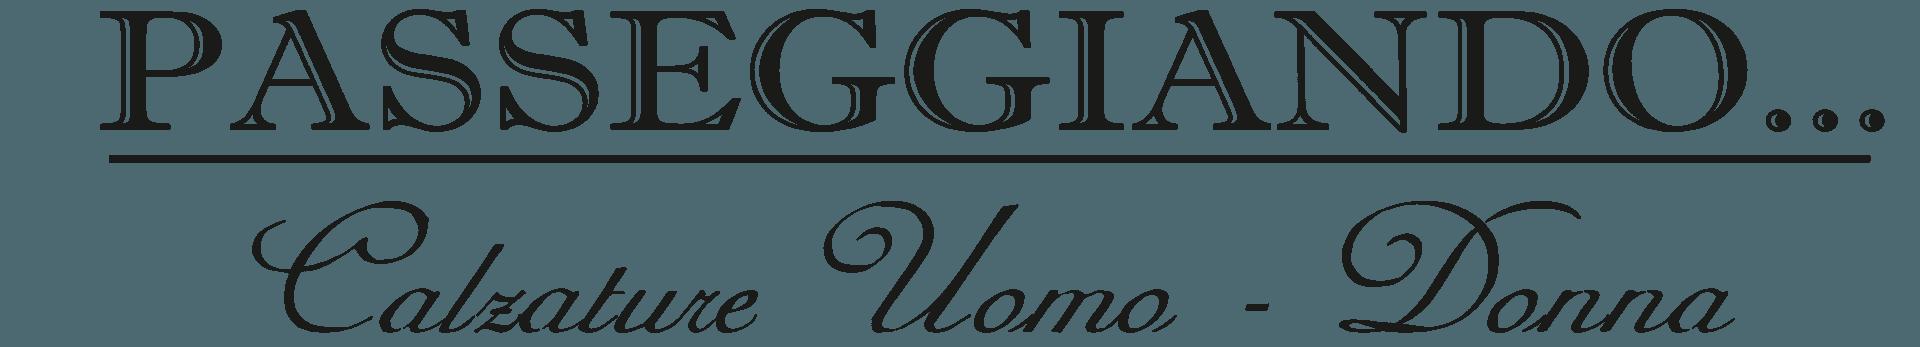 PASSEGGIANDO calzature uomo-donna logo